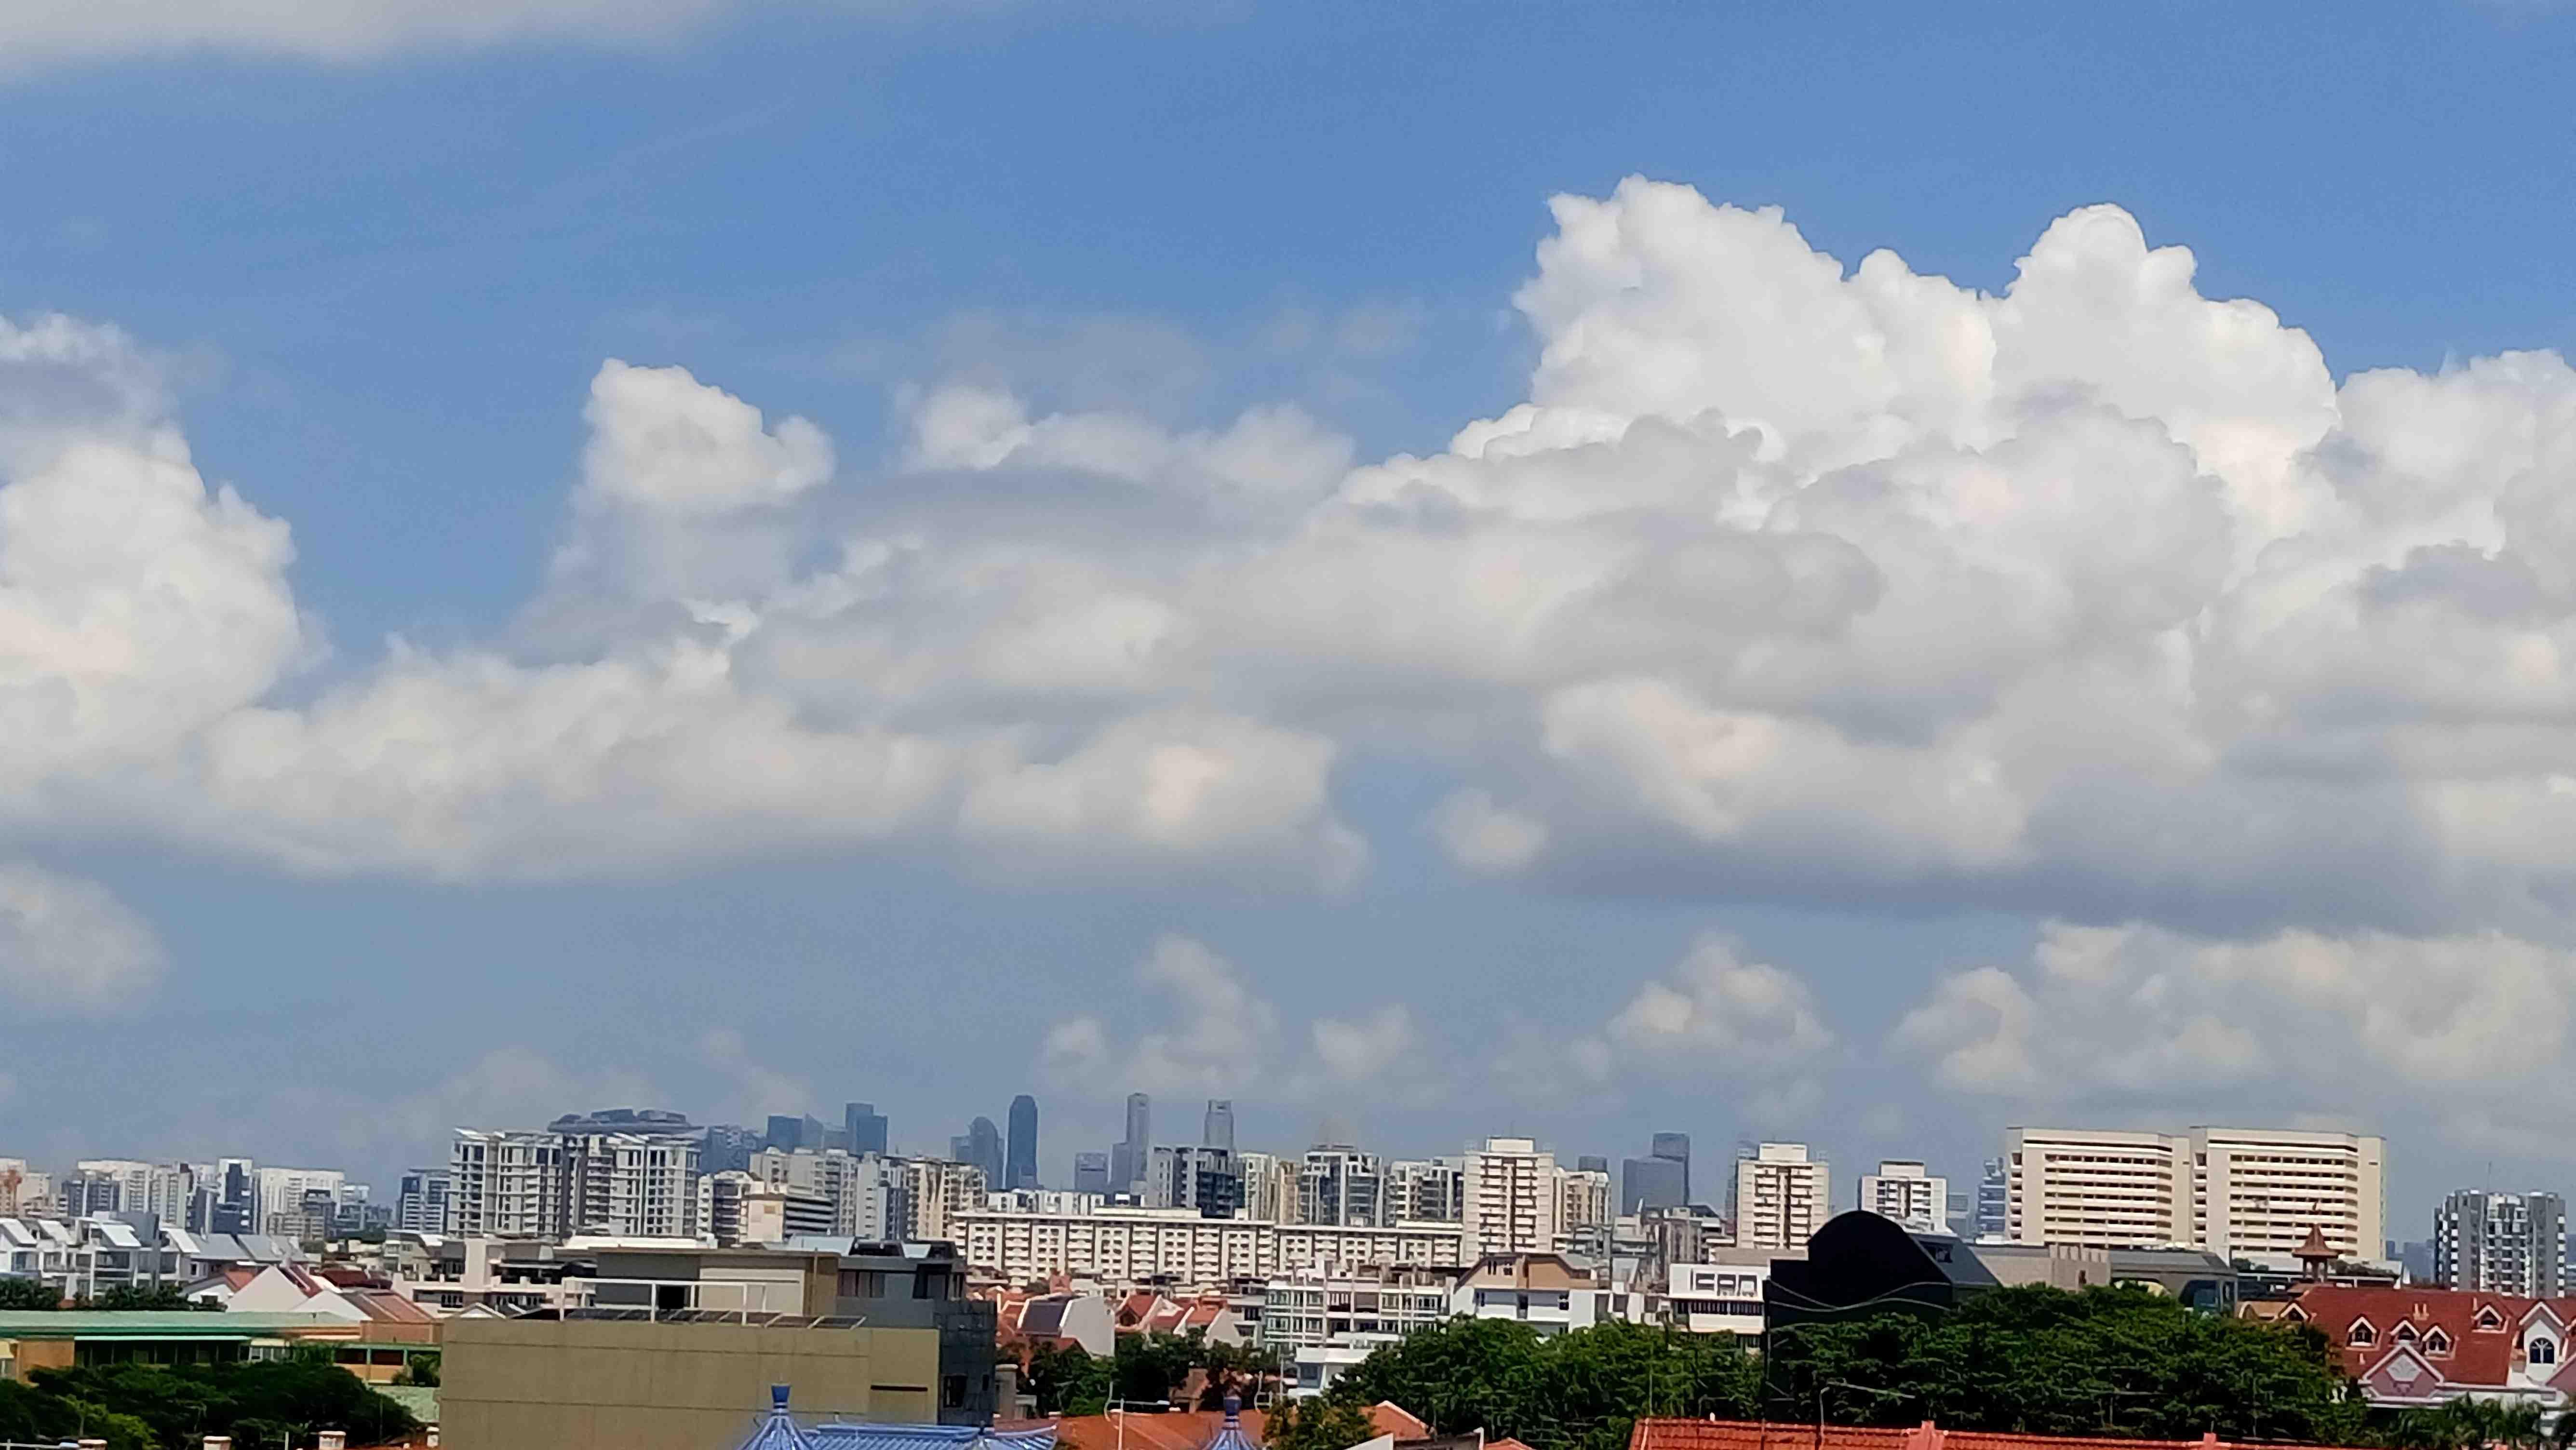 City view daytime aug17